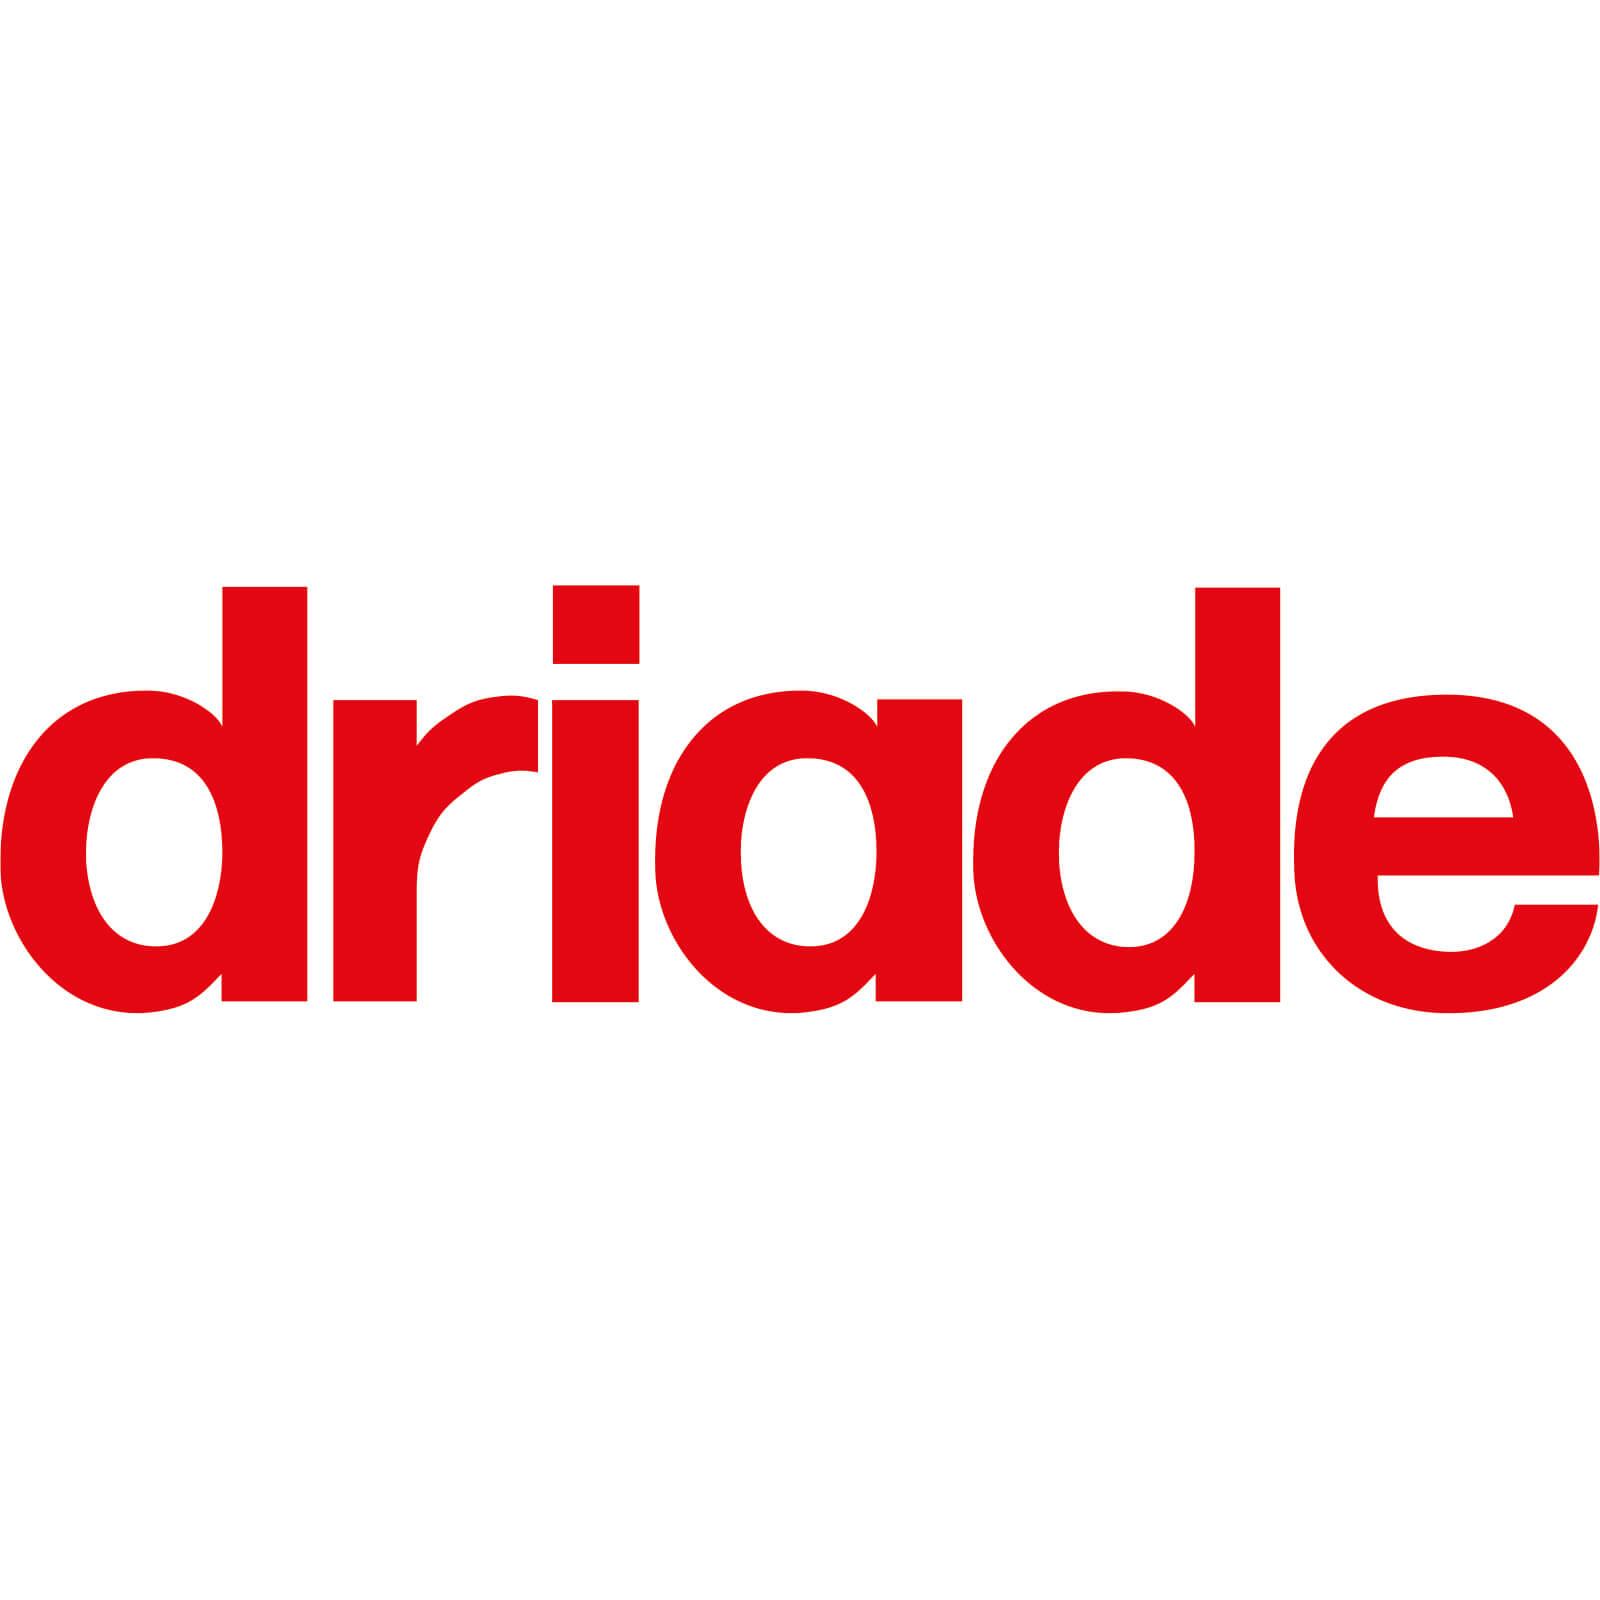 http://www.driade.com/media/catalog/product/cache/1/image/beff4985b56e3afdbeabfc89641a4582/1/3/13_18.jpg